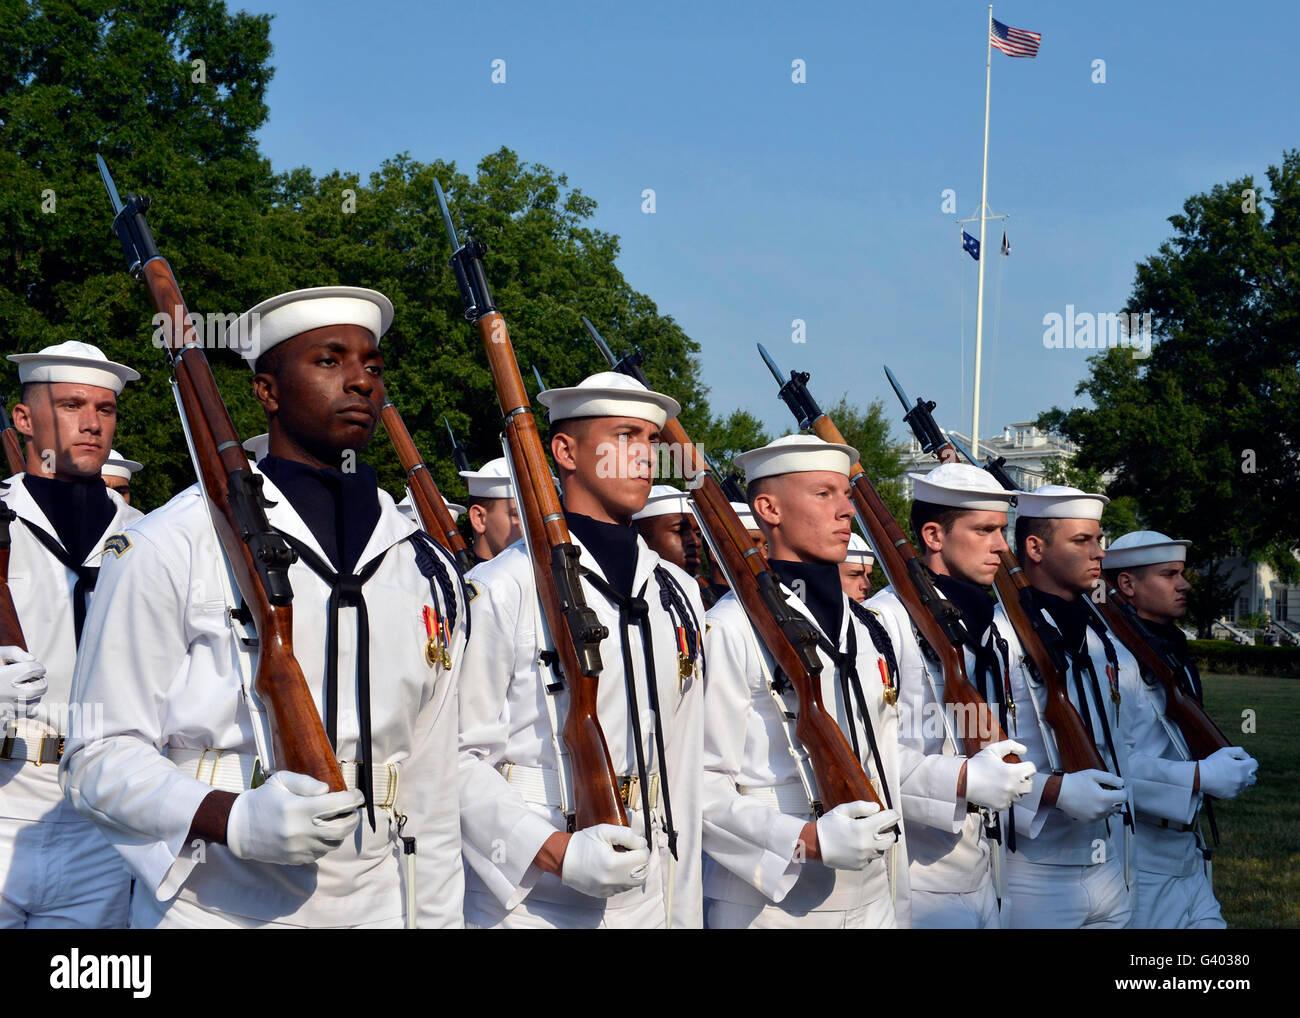 Us Navy Ceremonial Guard Stock Photos Us Navy Ceremonial Guard - Us-navy-ceremonial-guard